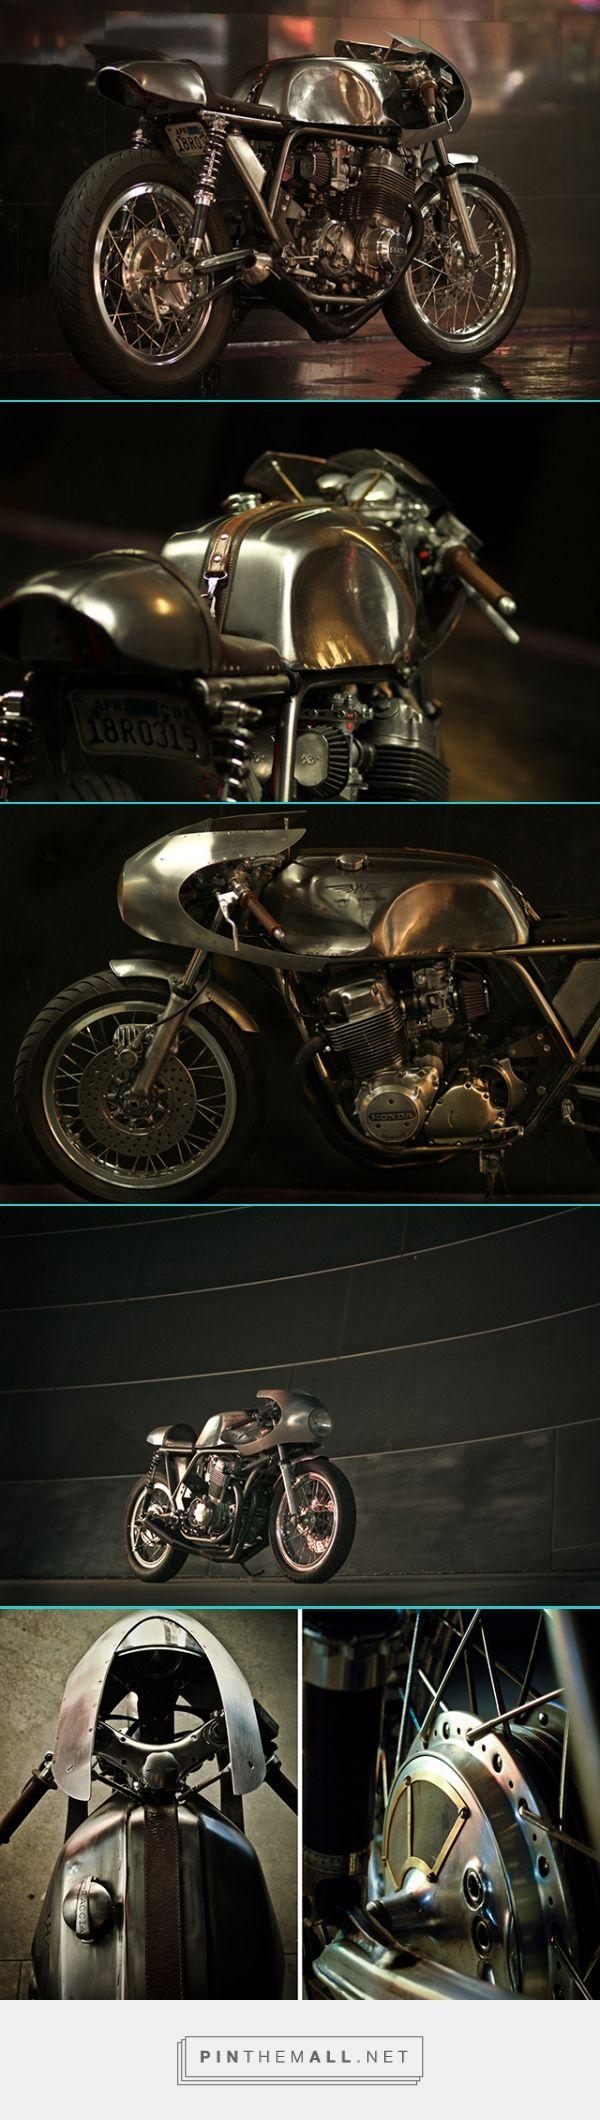 76' Honda CB750 by Raccia Motorcycles - Pipeburn.com - created via https://pinthemall.net